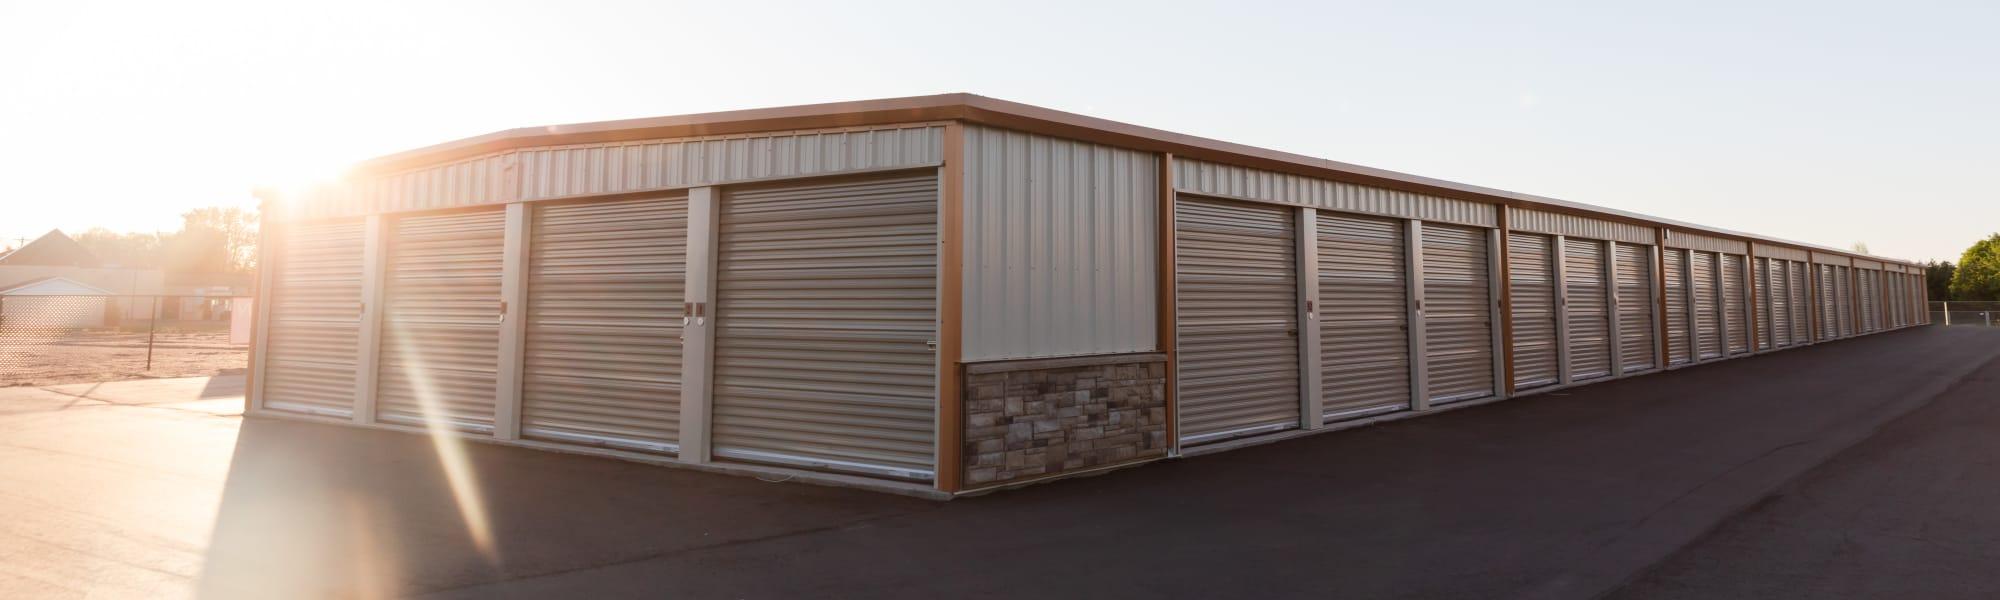 Outdoor storage units at KO Storage in Minnetonka, Minnesota